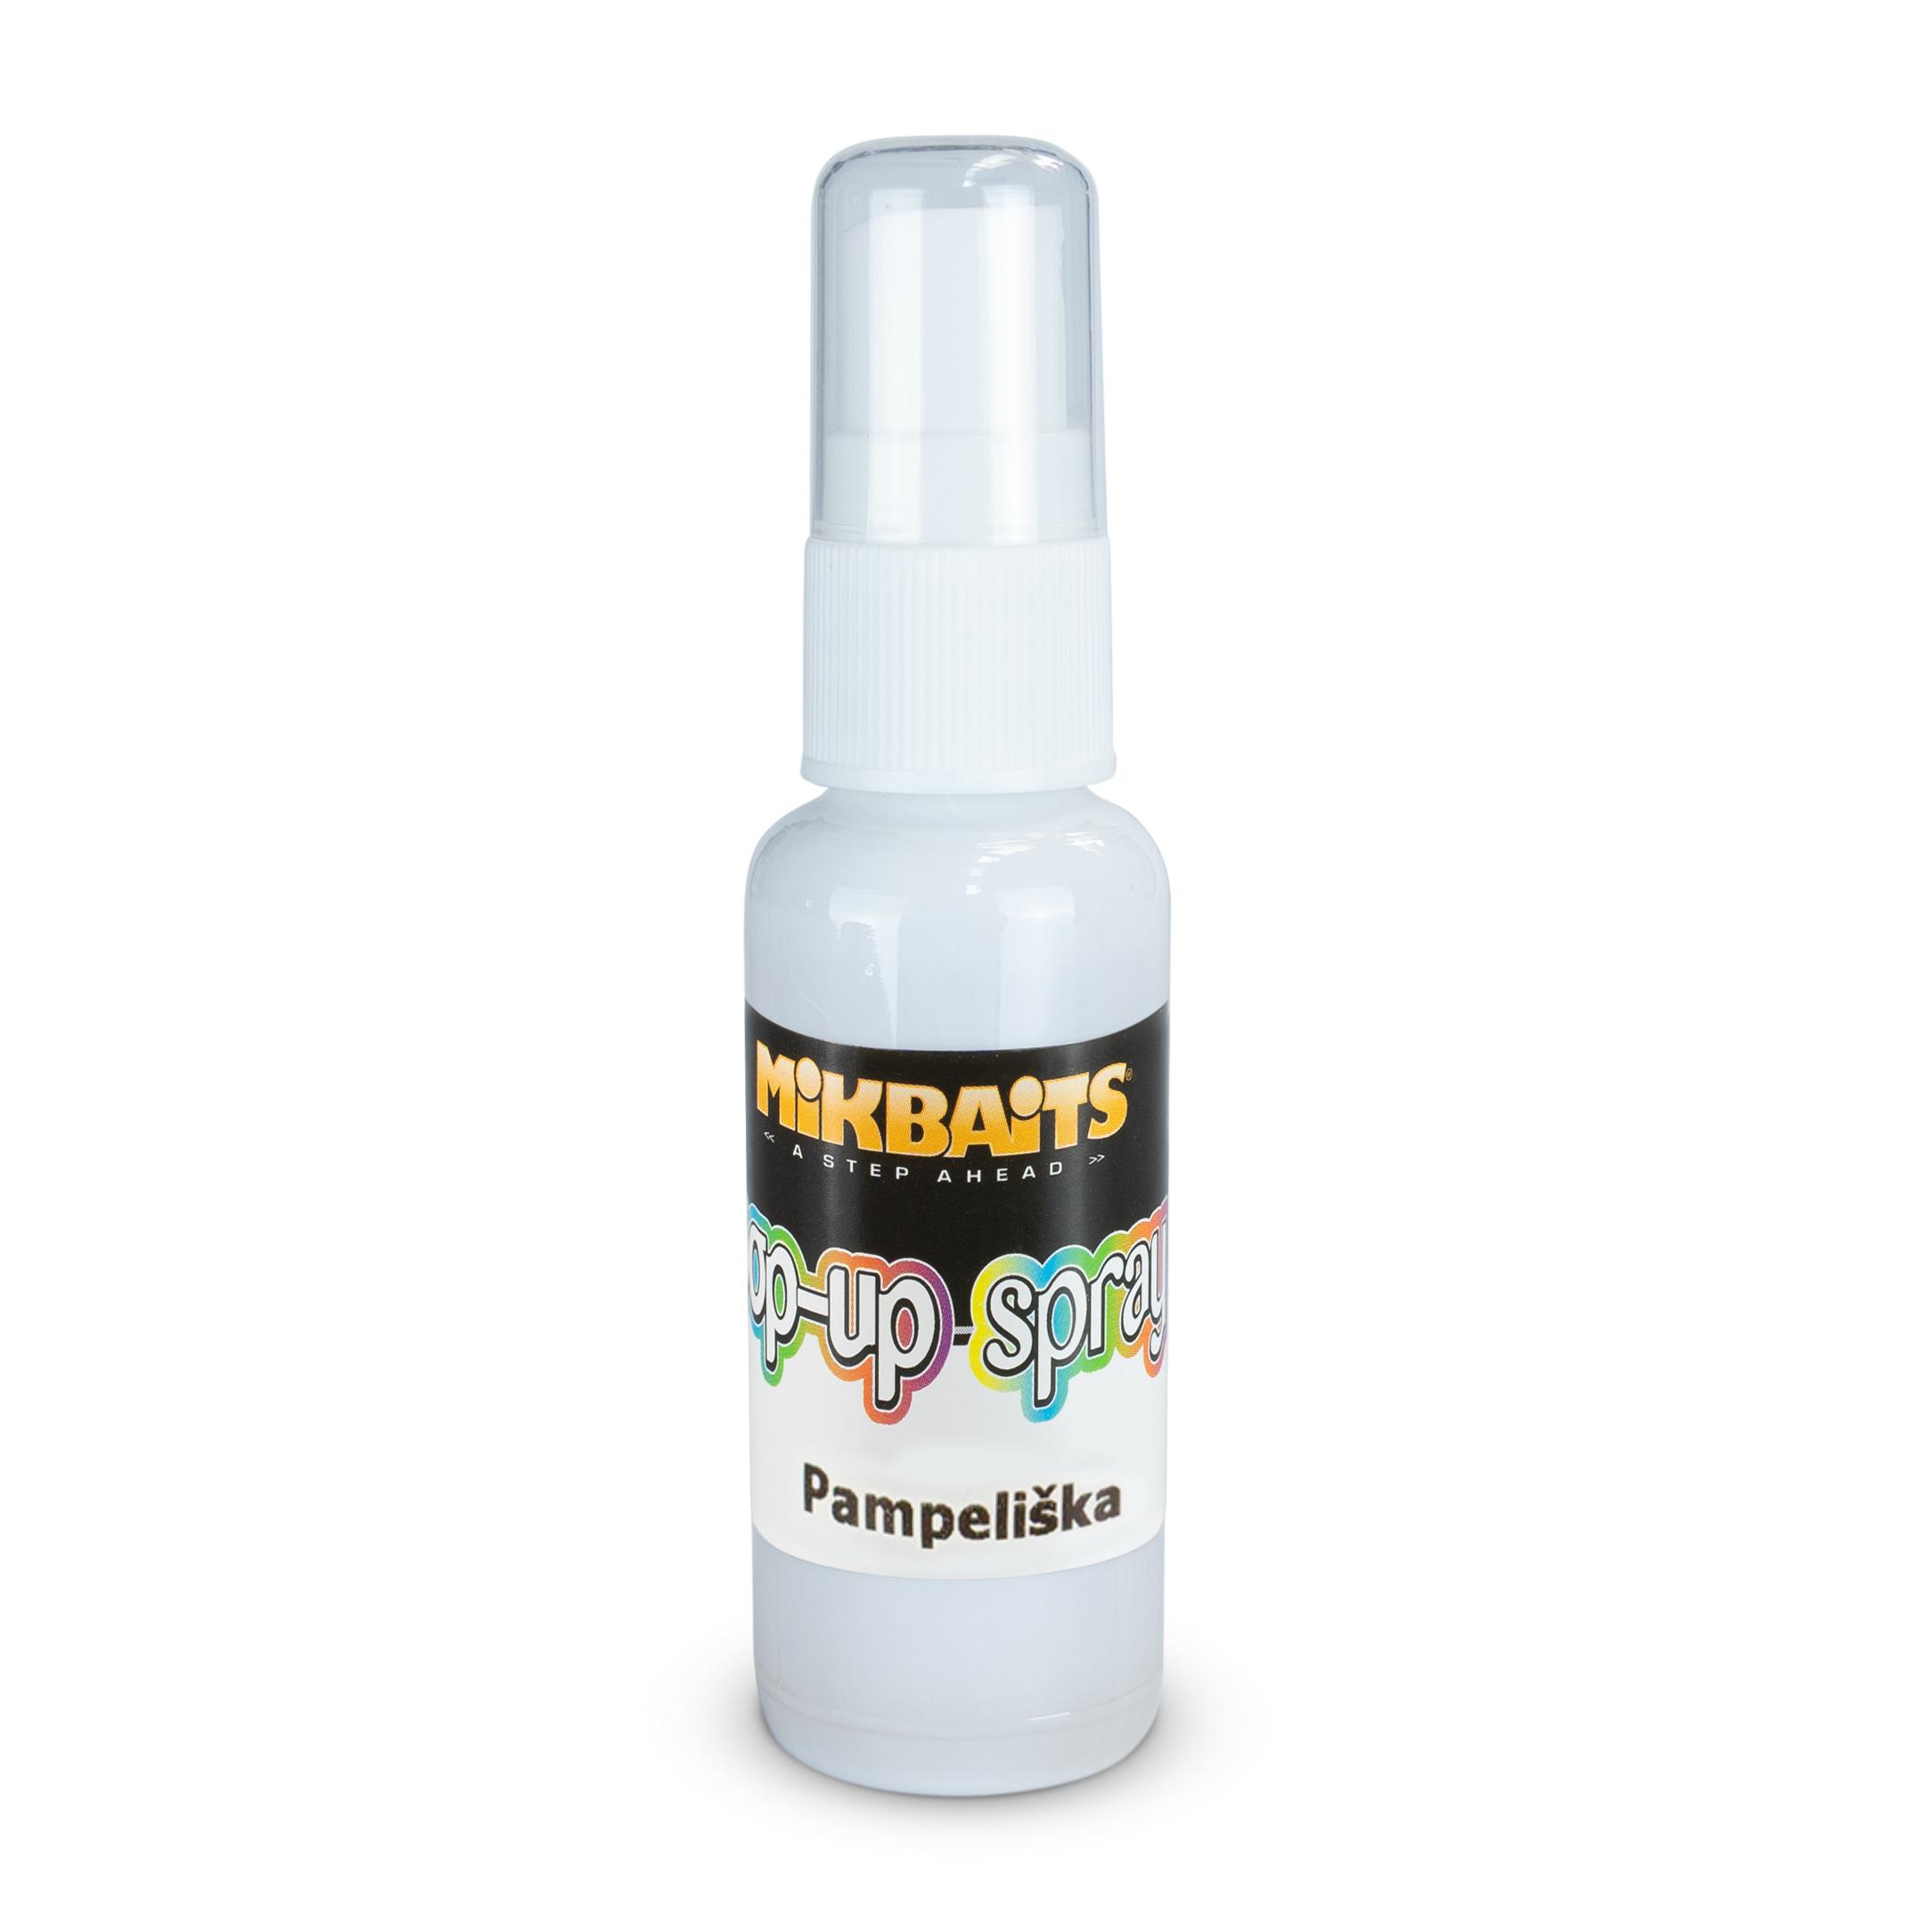 Pop-up spray 30ml - Pampeliška